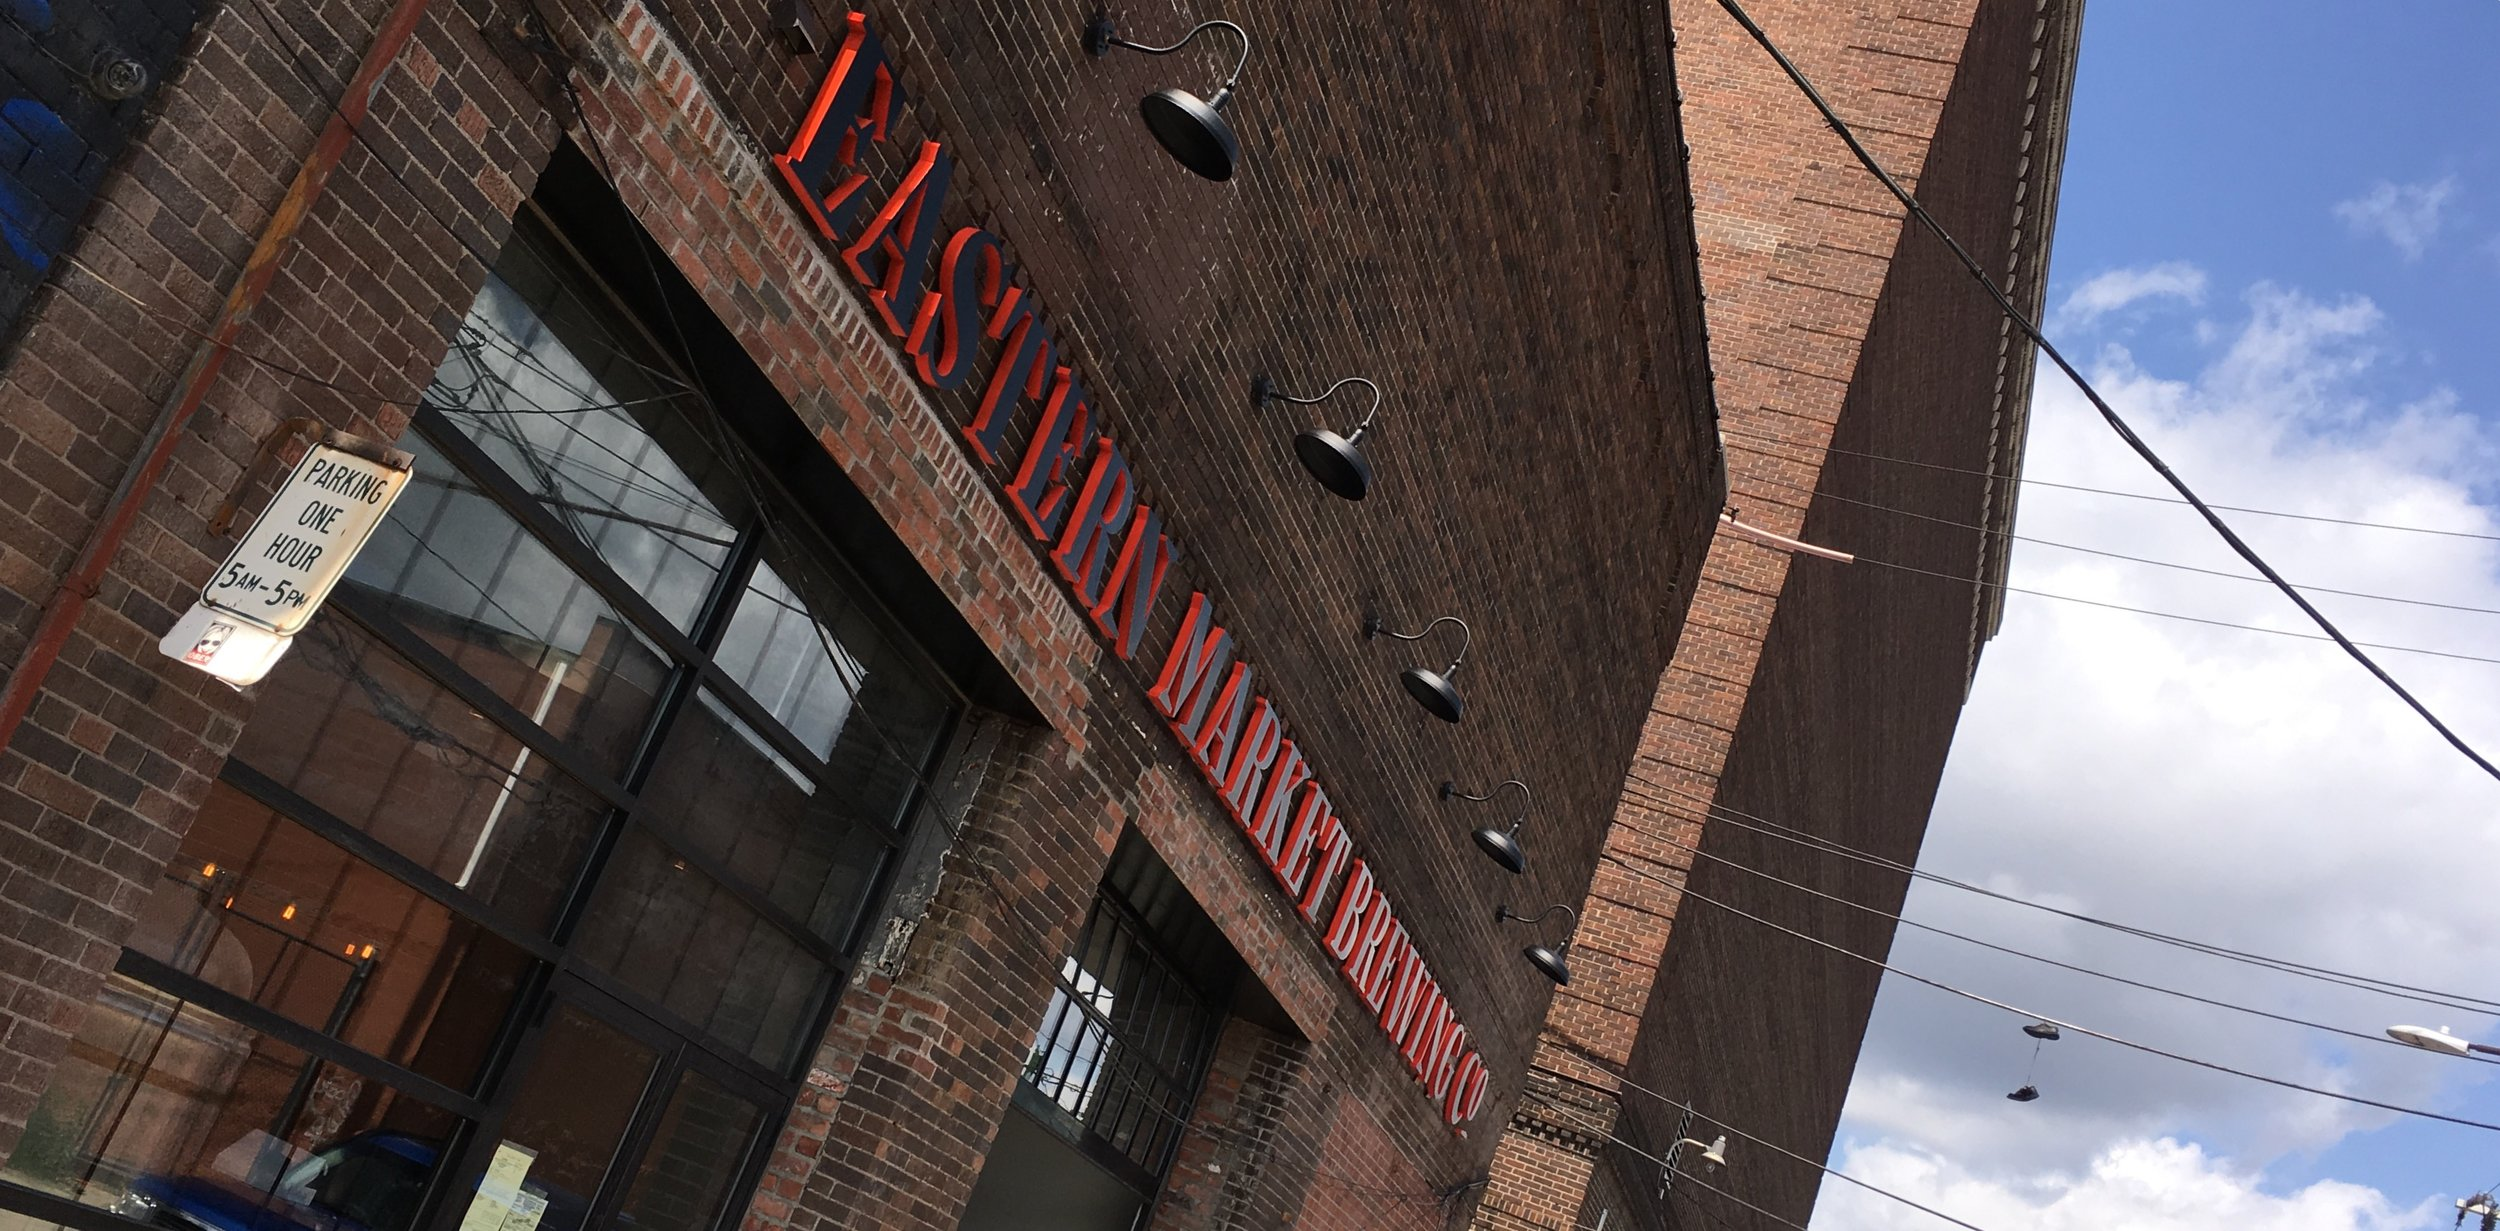 Eastern Market Brewing Co. main entrance